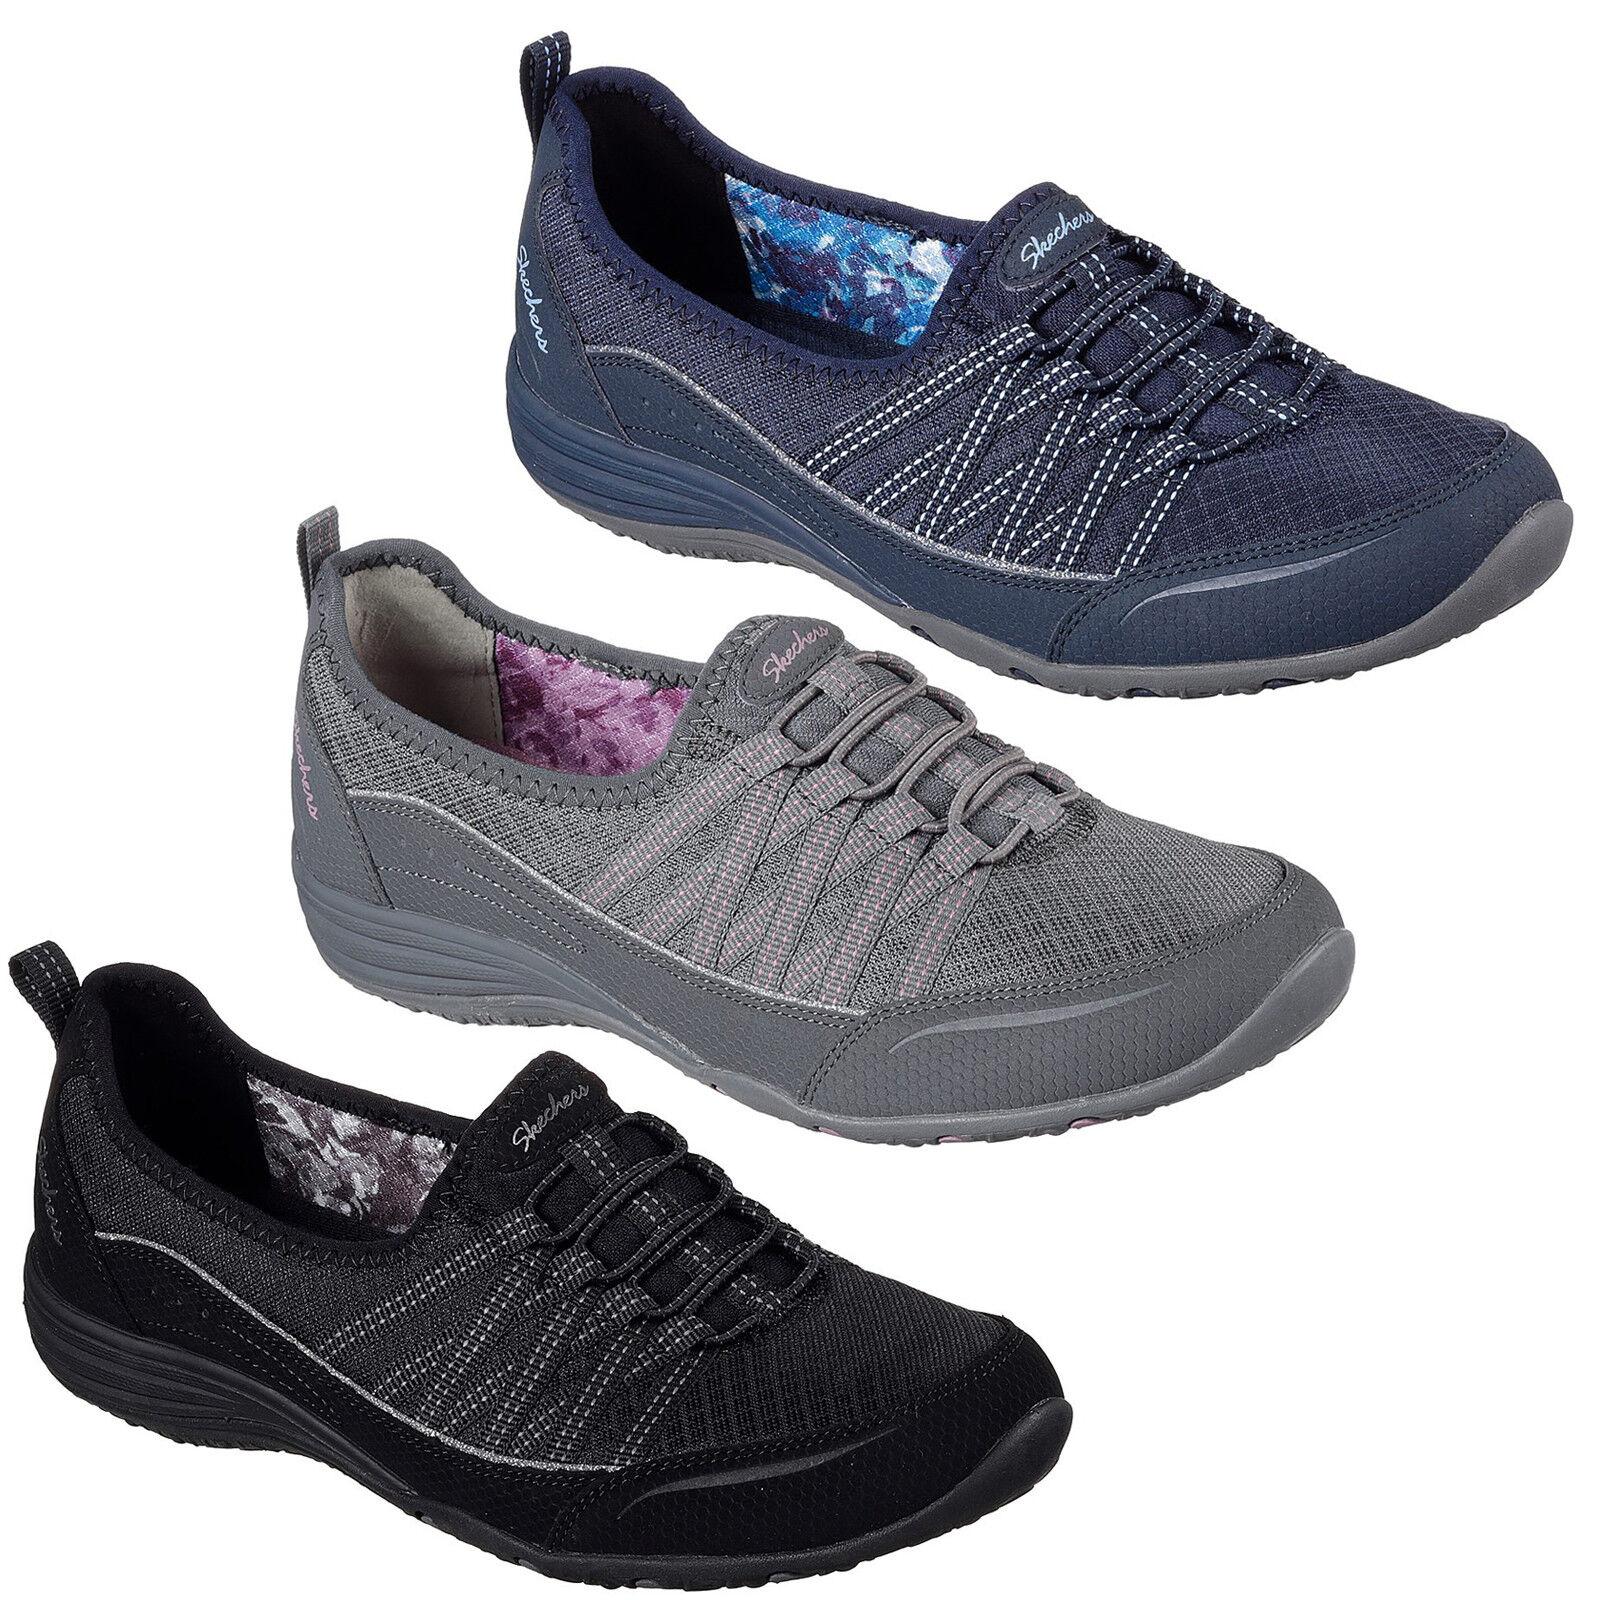 Skechers Unity pensa in grande yoga SCARPE MEMORY FOAM elastico yoga grande da donna scarpe basse pompe d1192b